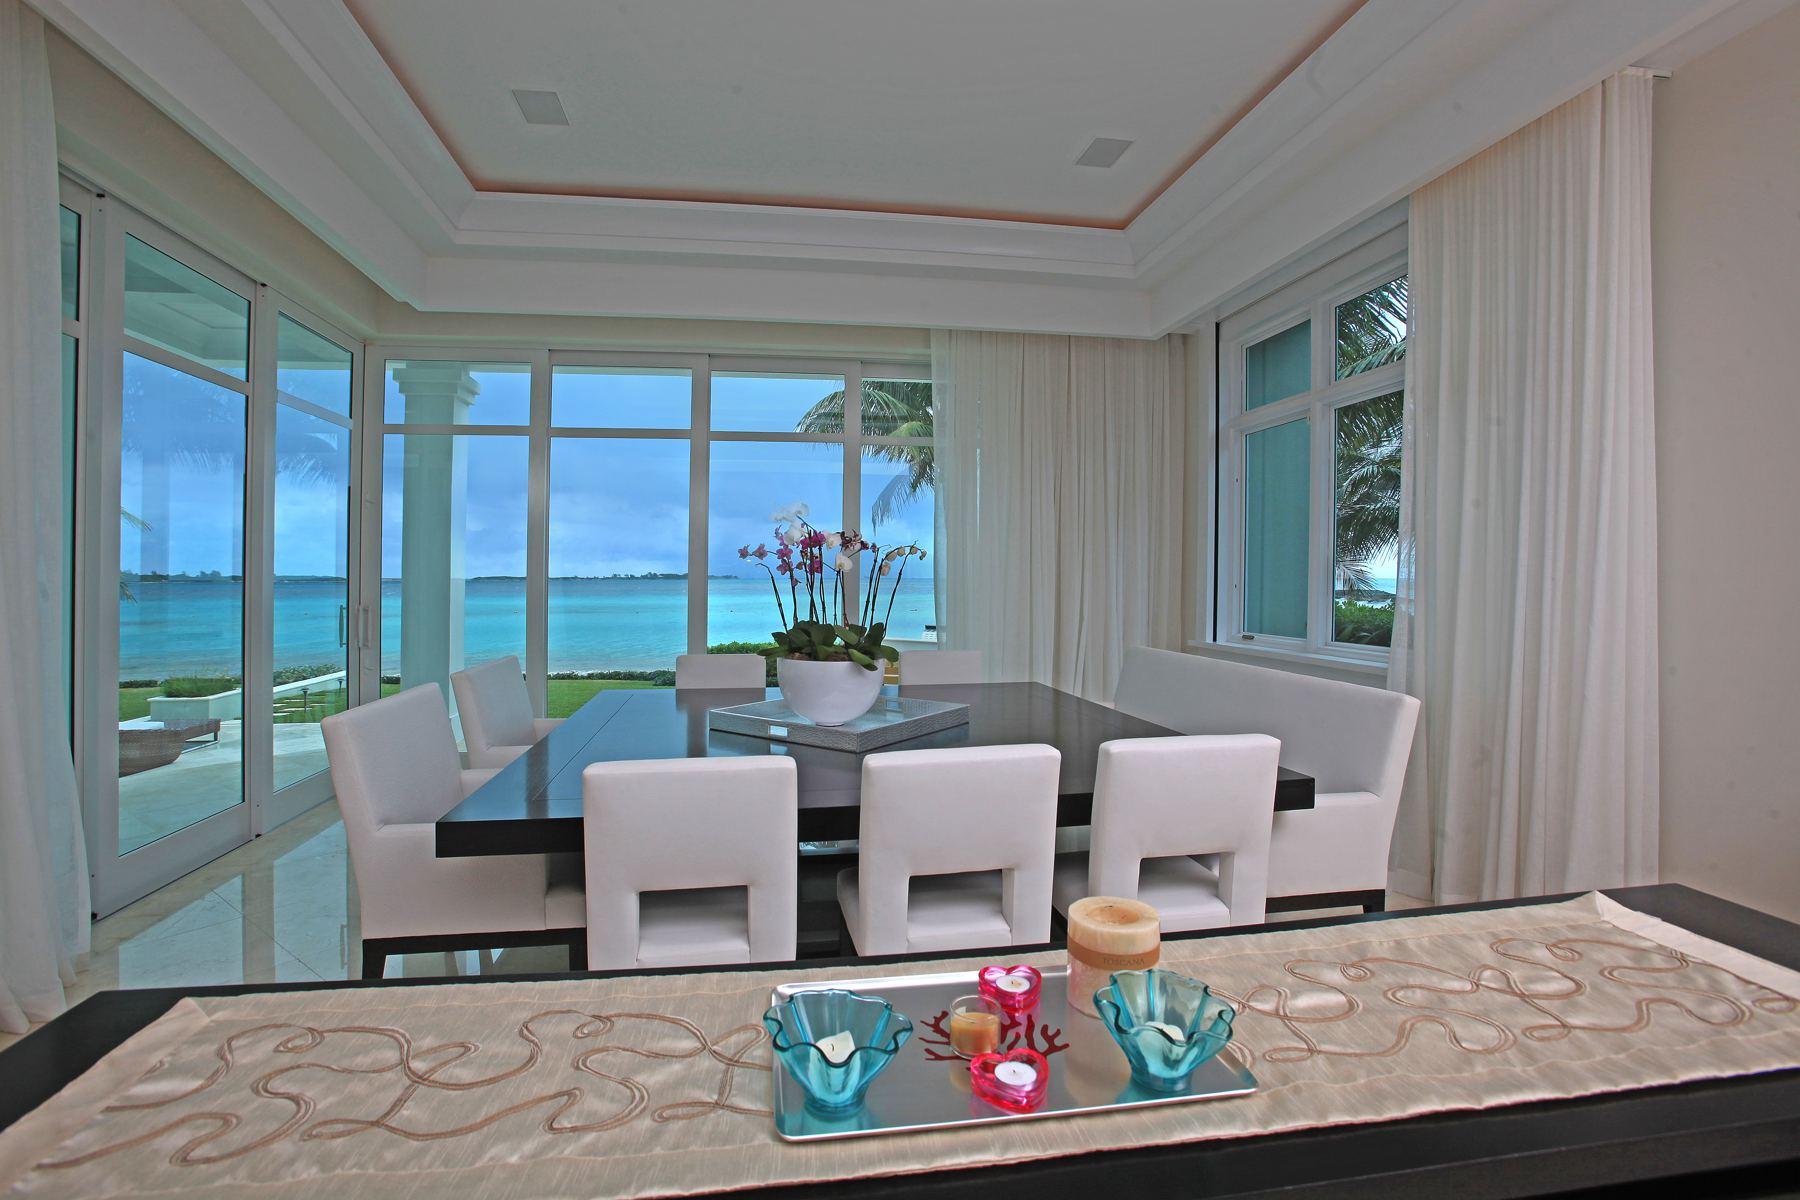 Additional photo for property listing at Ocean Club Estates #38 Ocean Club Estates, Paradise Island, Nassau And Paradise Island Bahamas